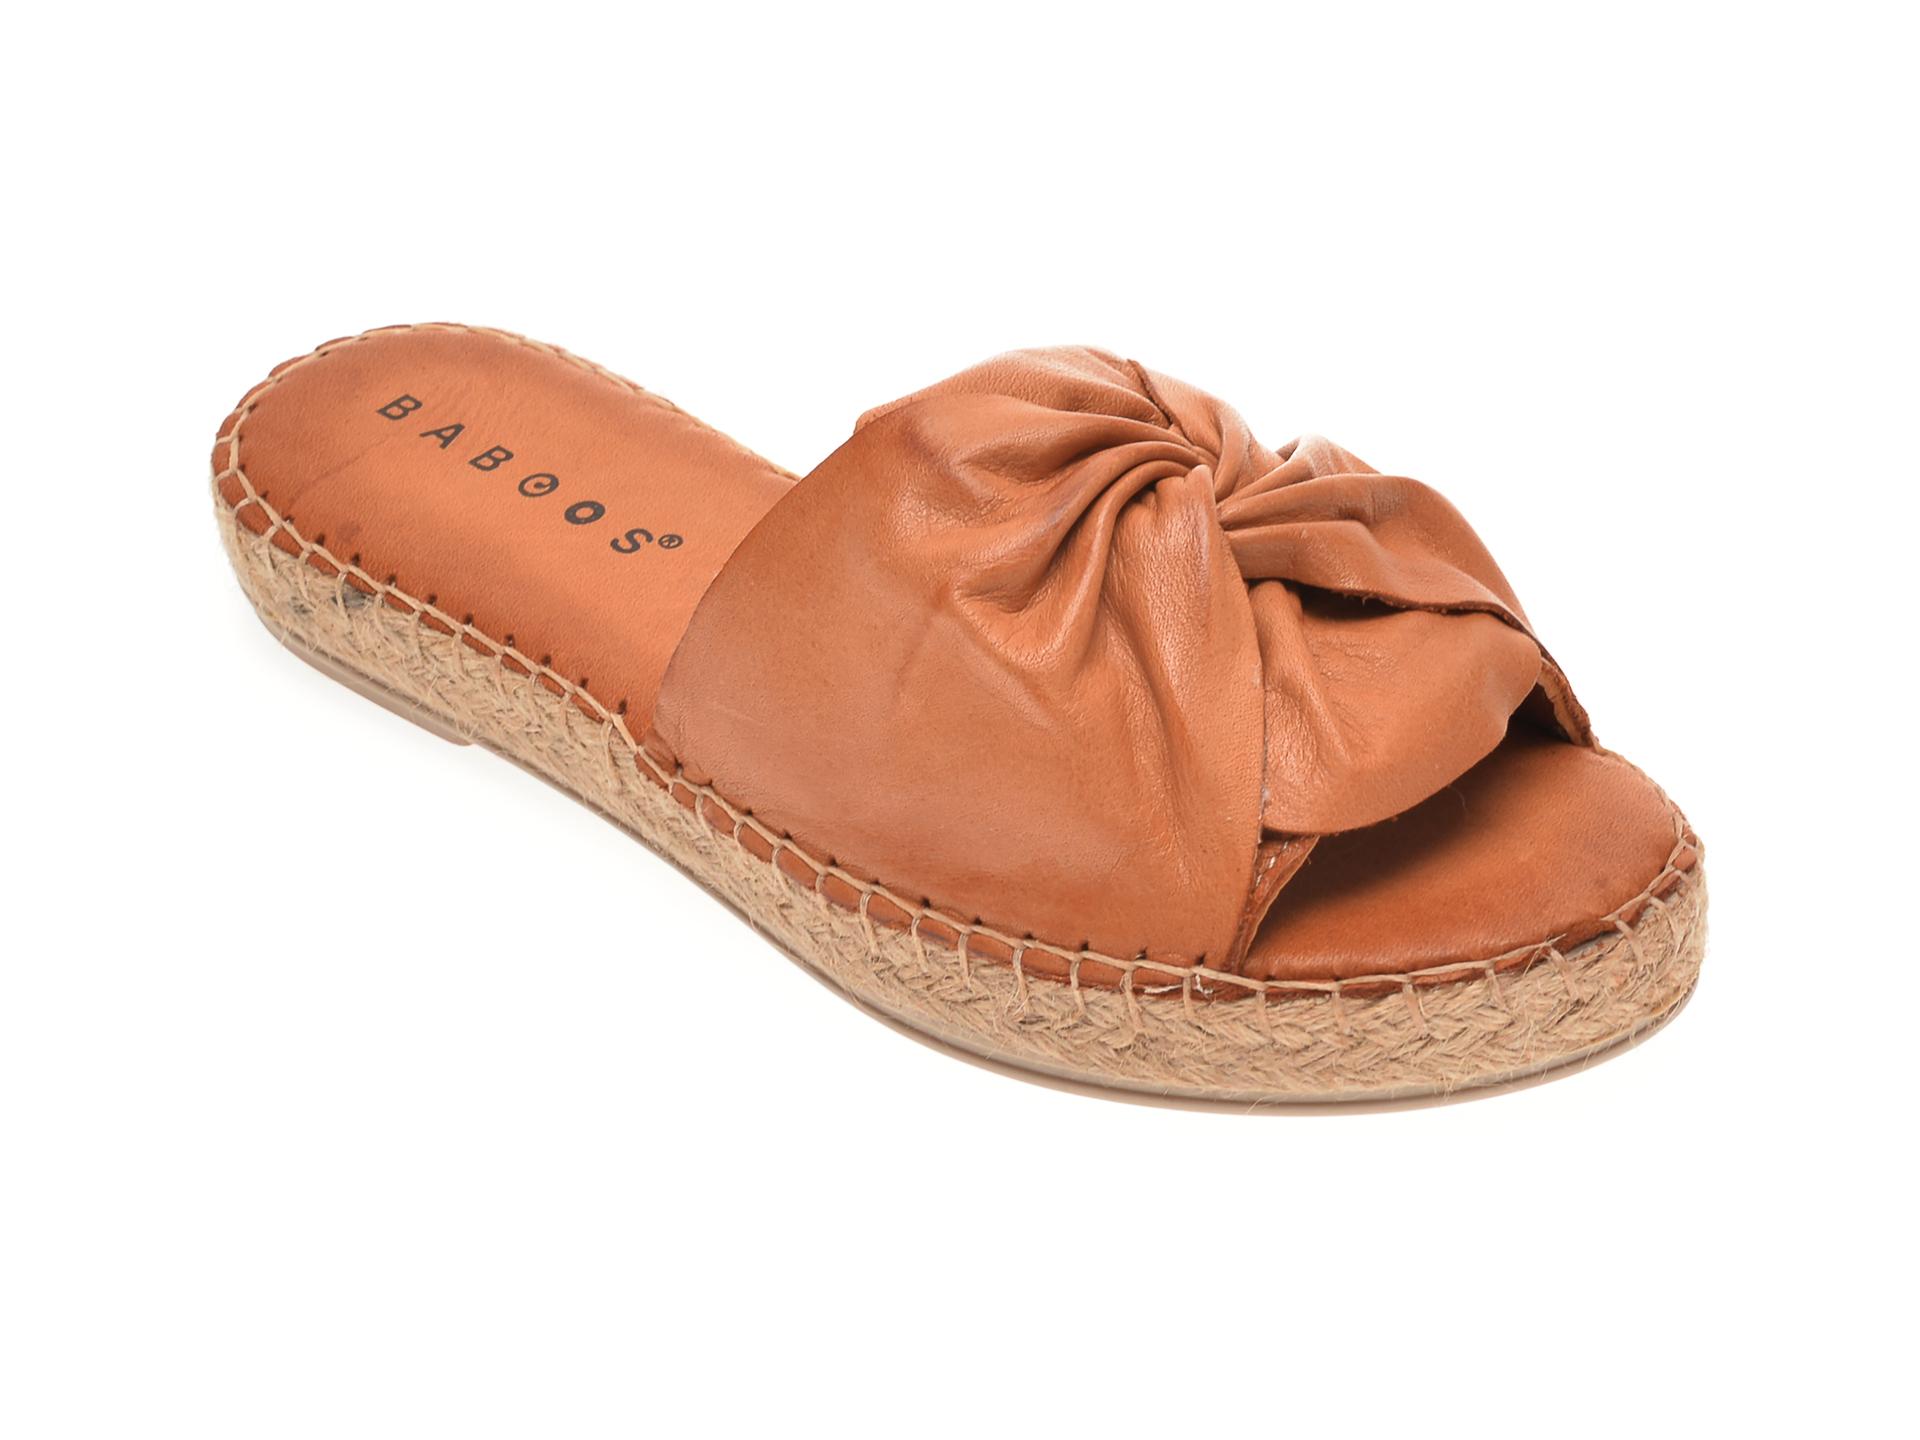 Papuci BABOOS maro, R08, din piele naturala imagine